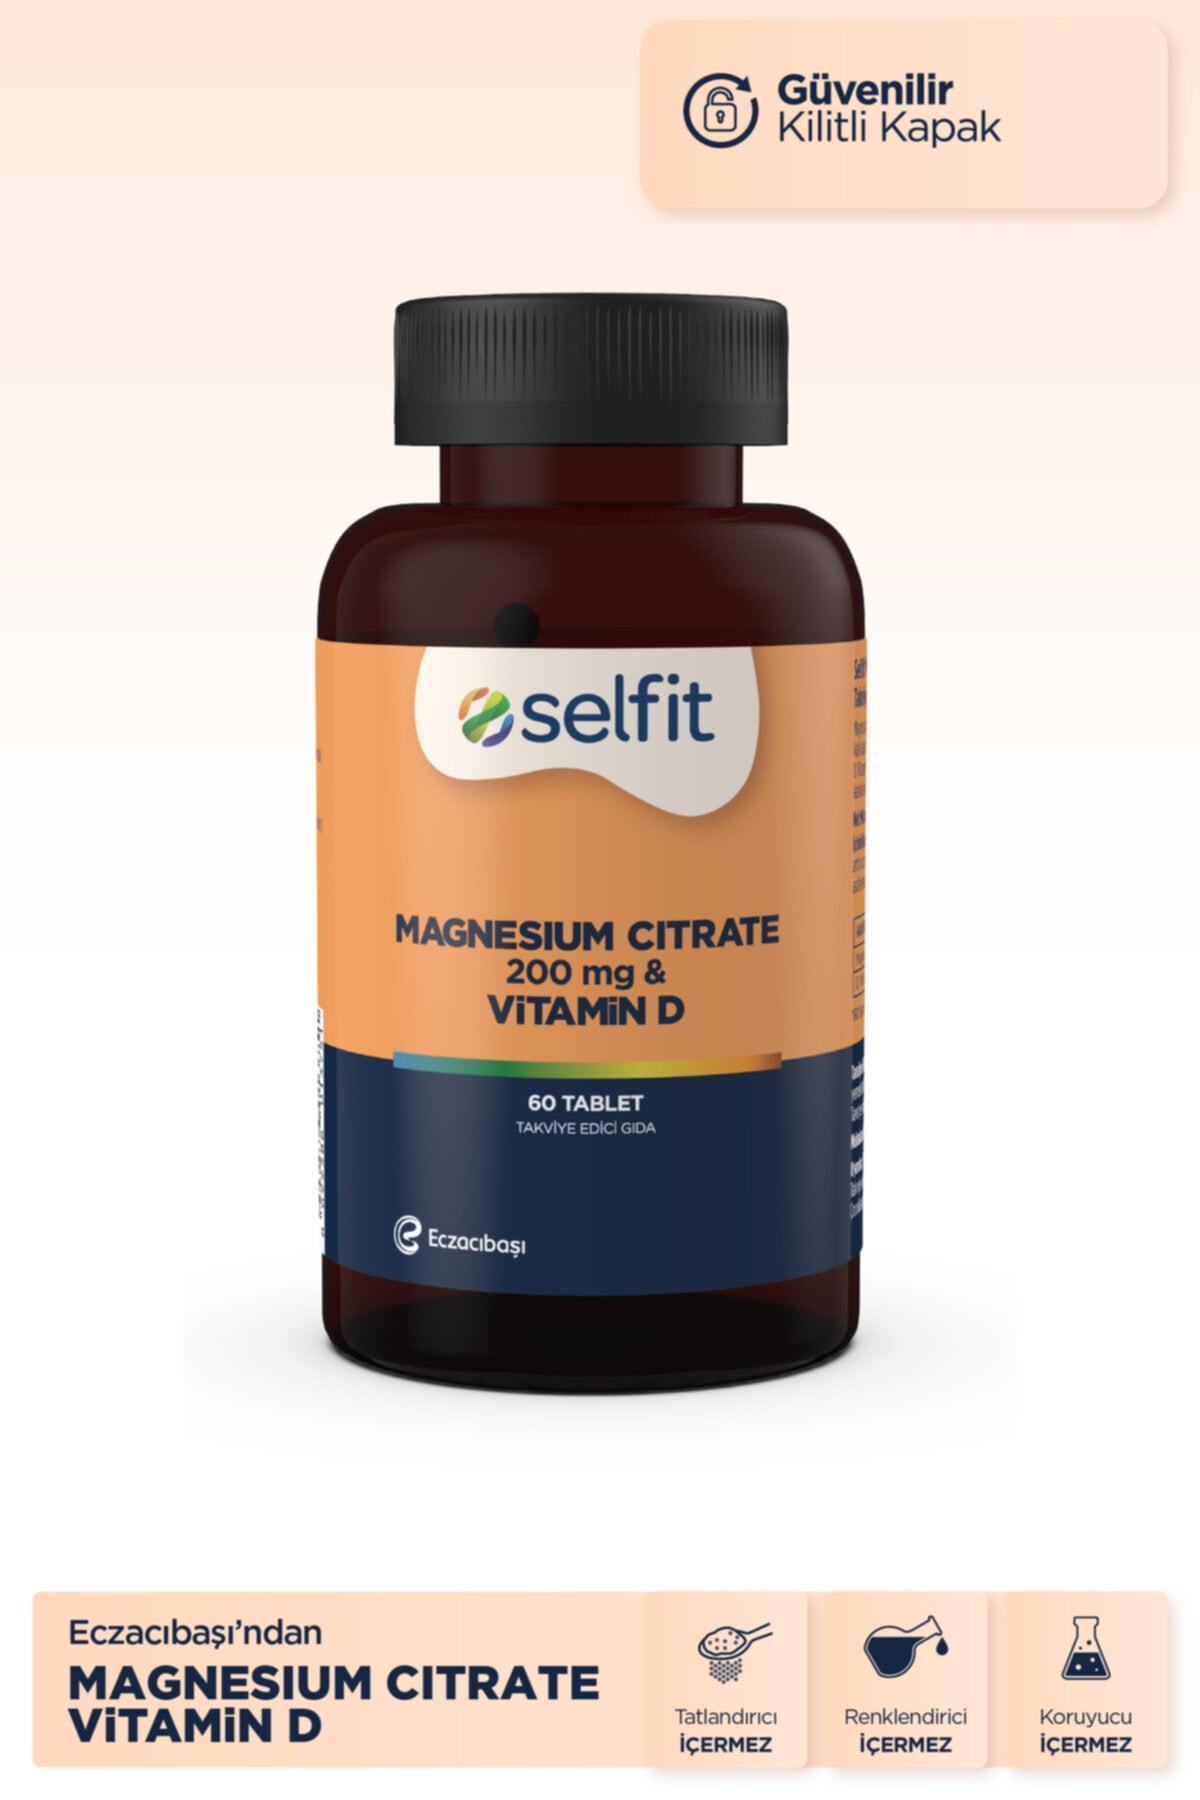 Eczacıbaşı Selfit Magnesium Citrate 200 Mg & D3 Vitamin 60 Tablet - Son Kullanma Tarihi: 01.2023 2